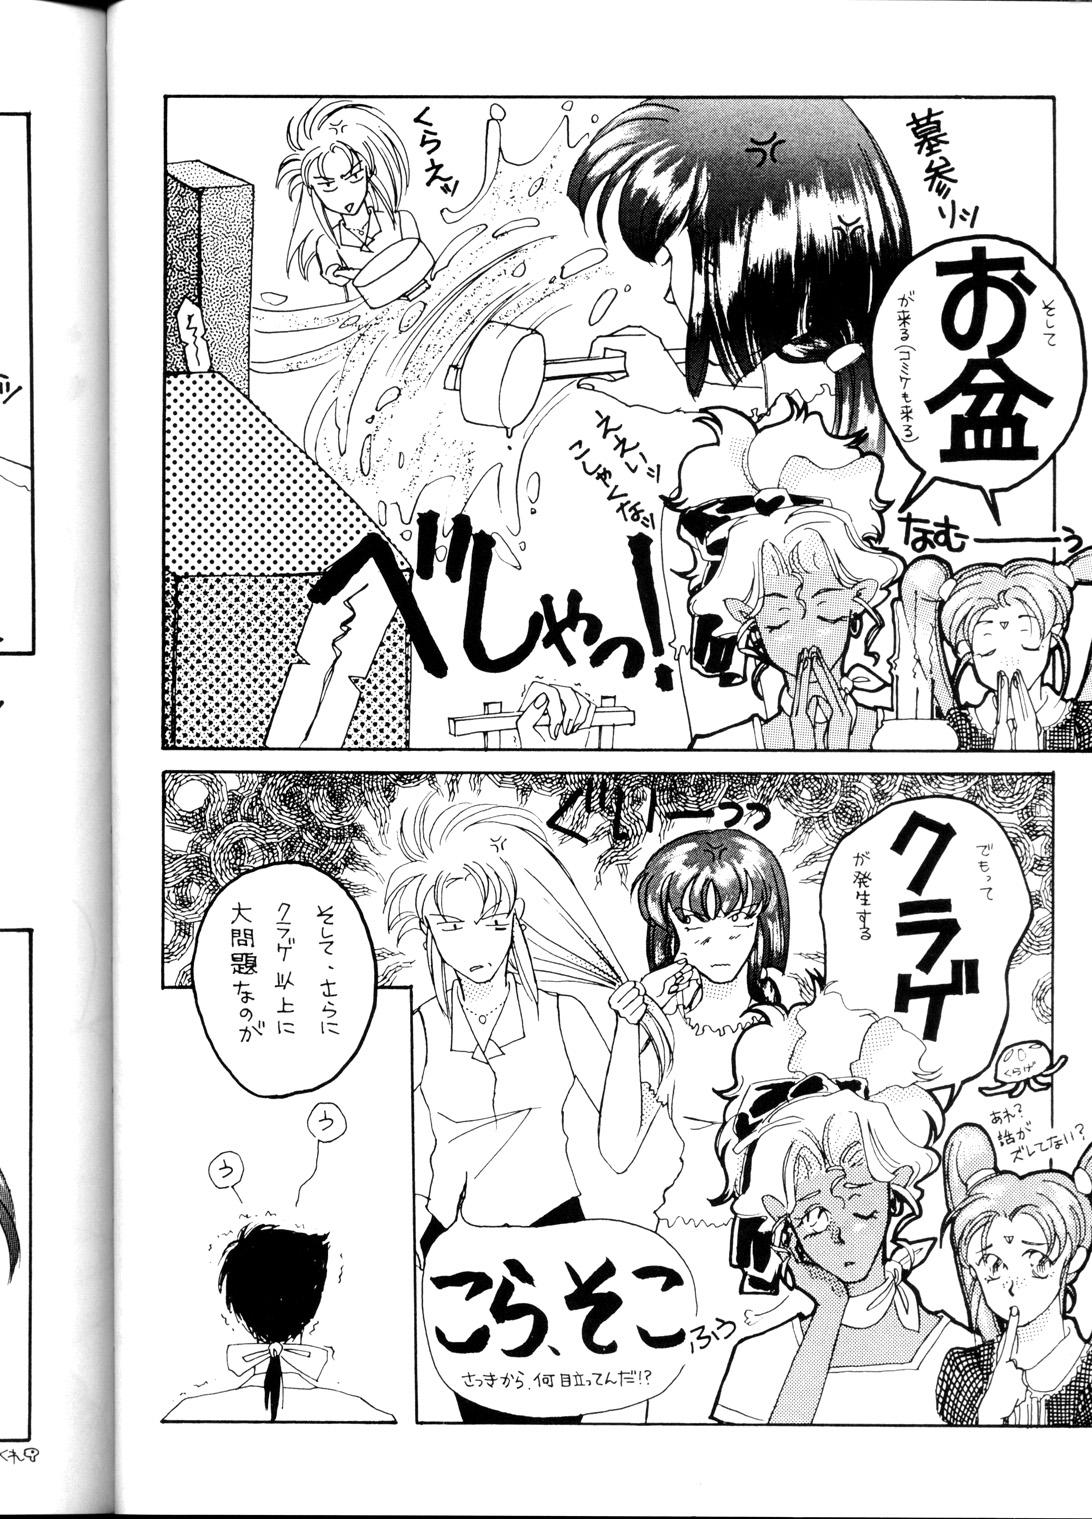 [B.B.C] Tenchi Muyou! Ryou-ou-ki Kaiteiben (Tenchi Muyou!) 52